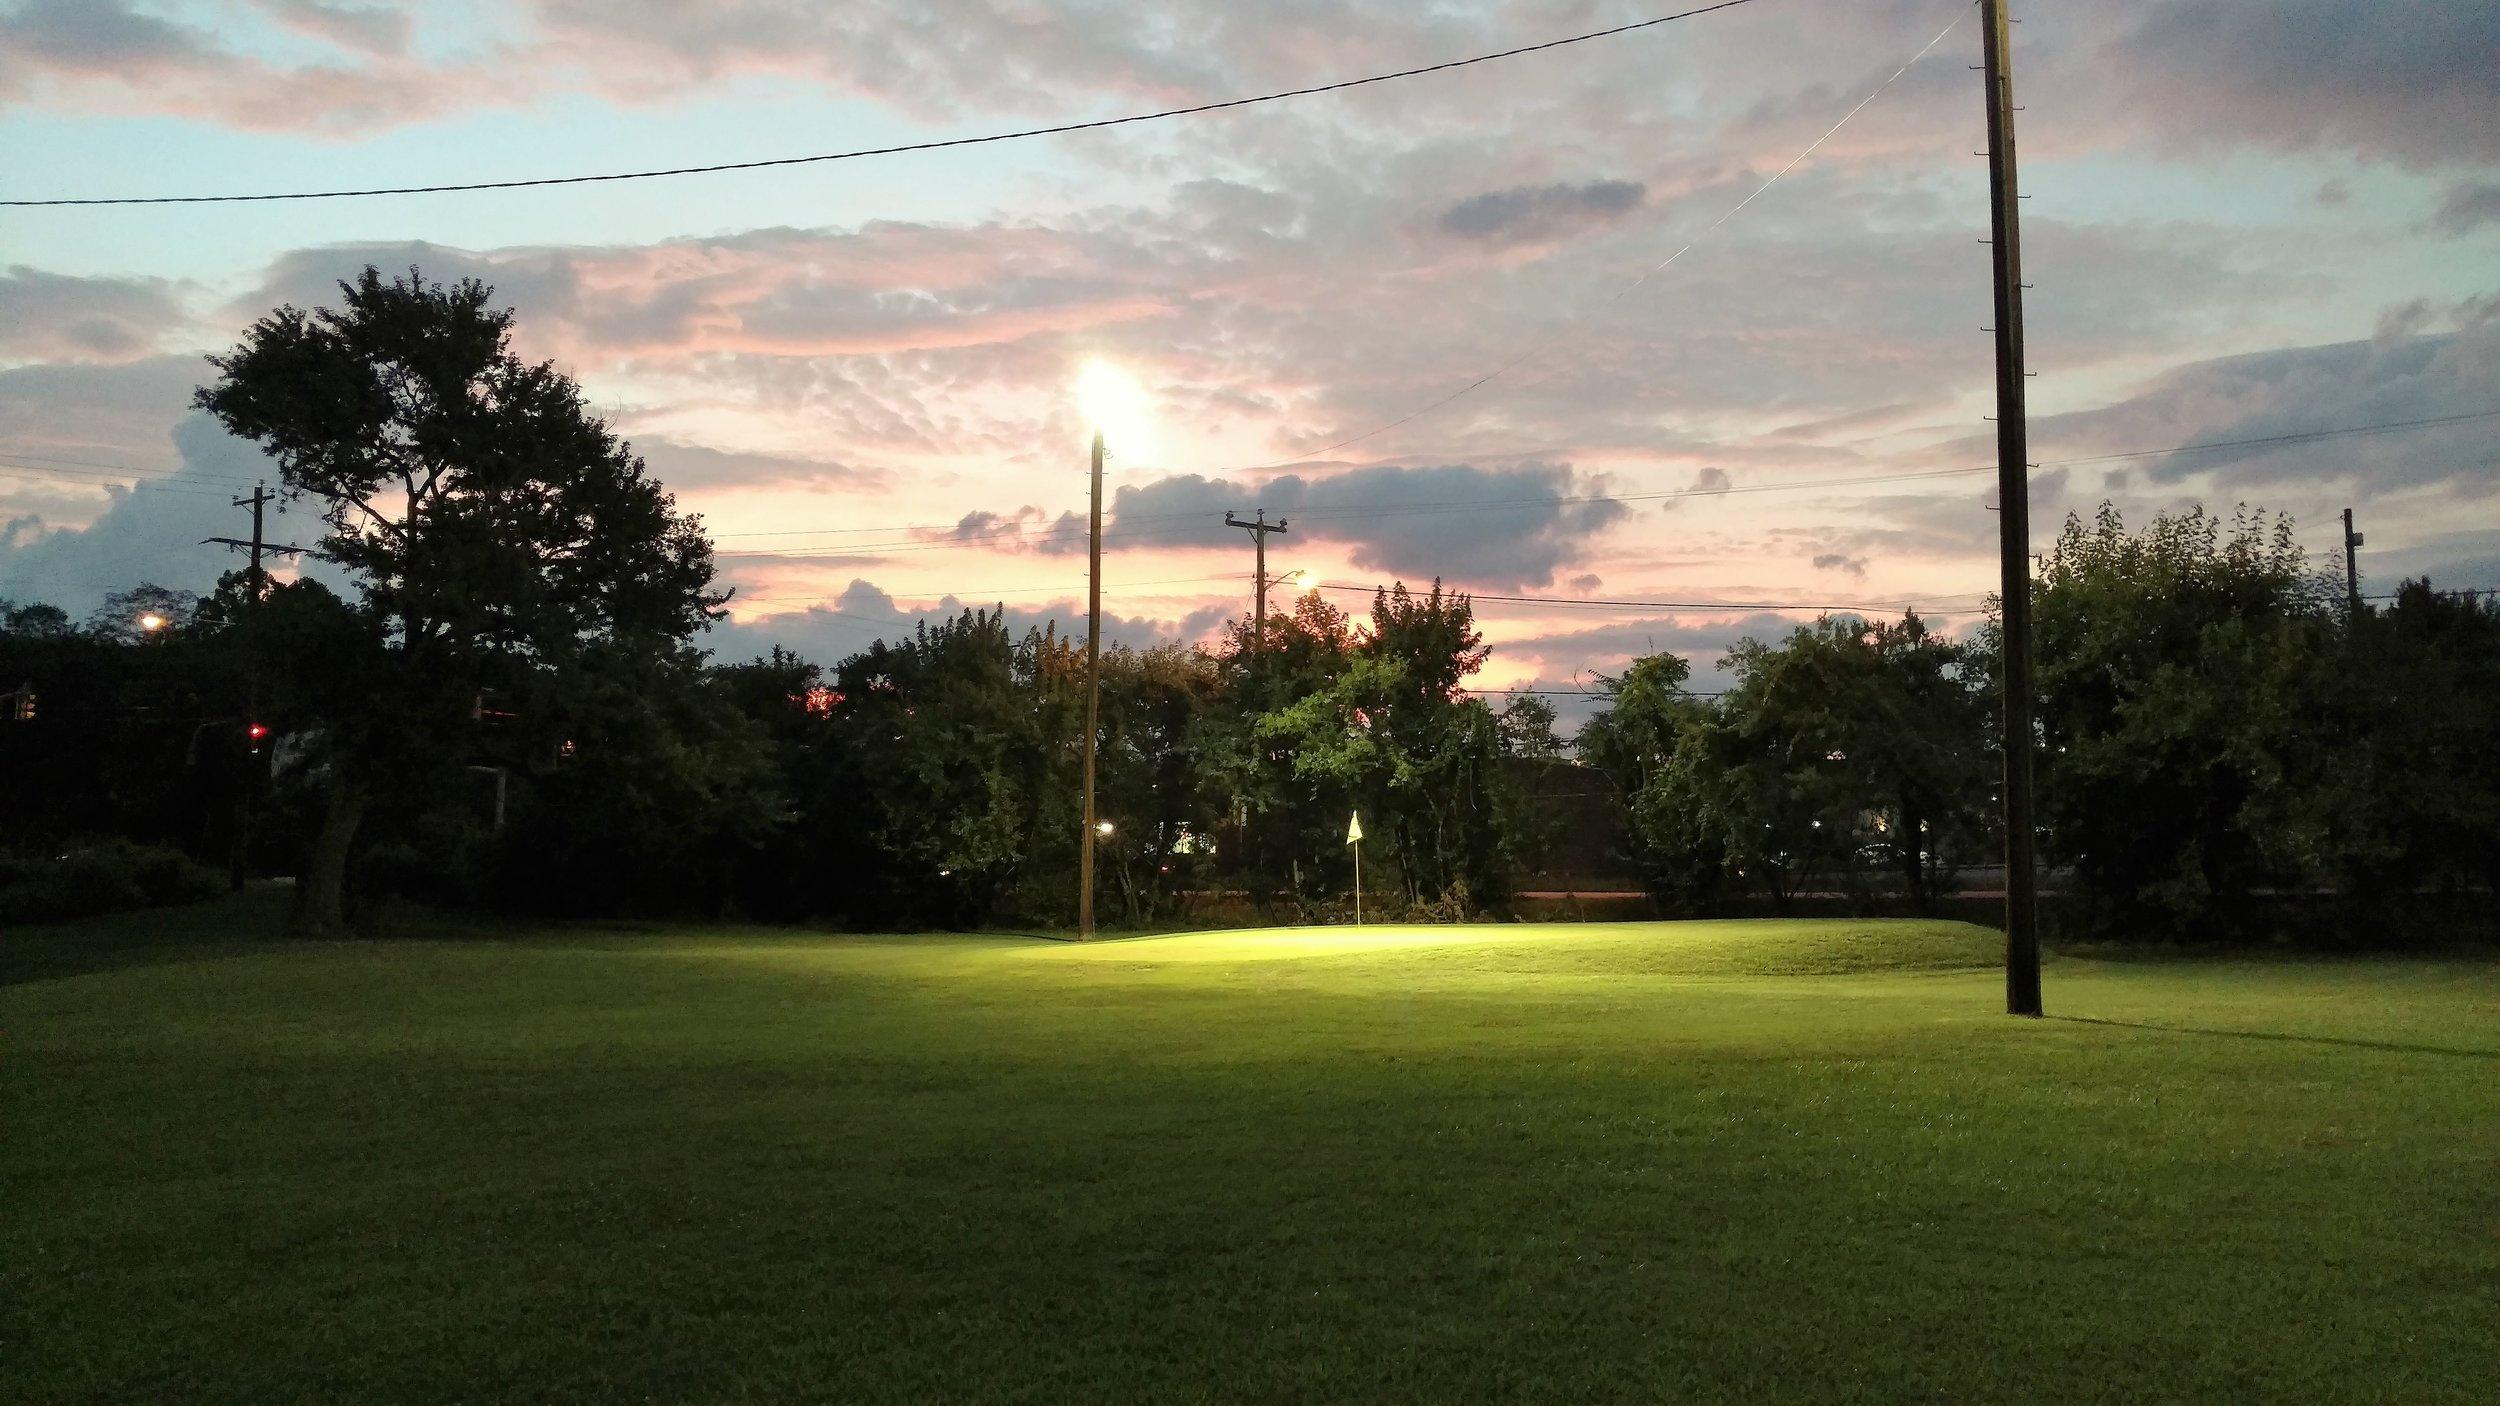 07-17-18 Sundown.jpg